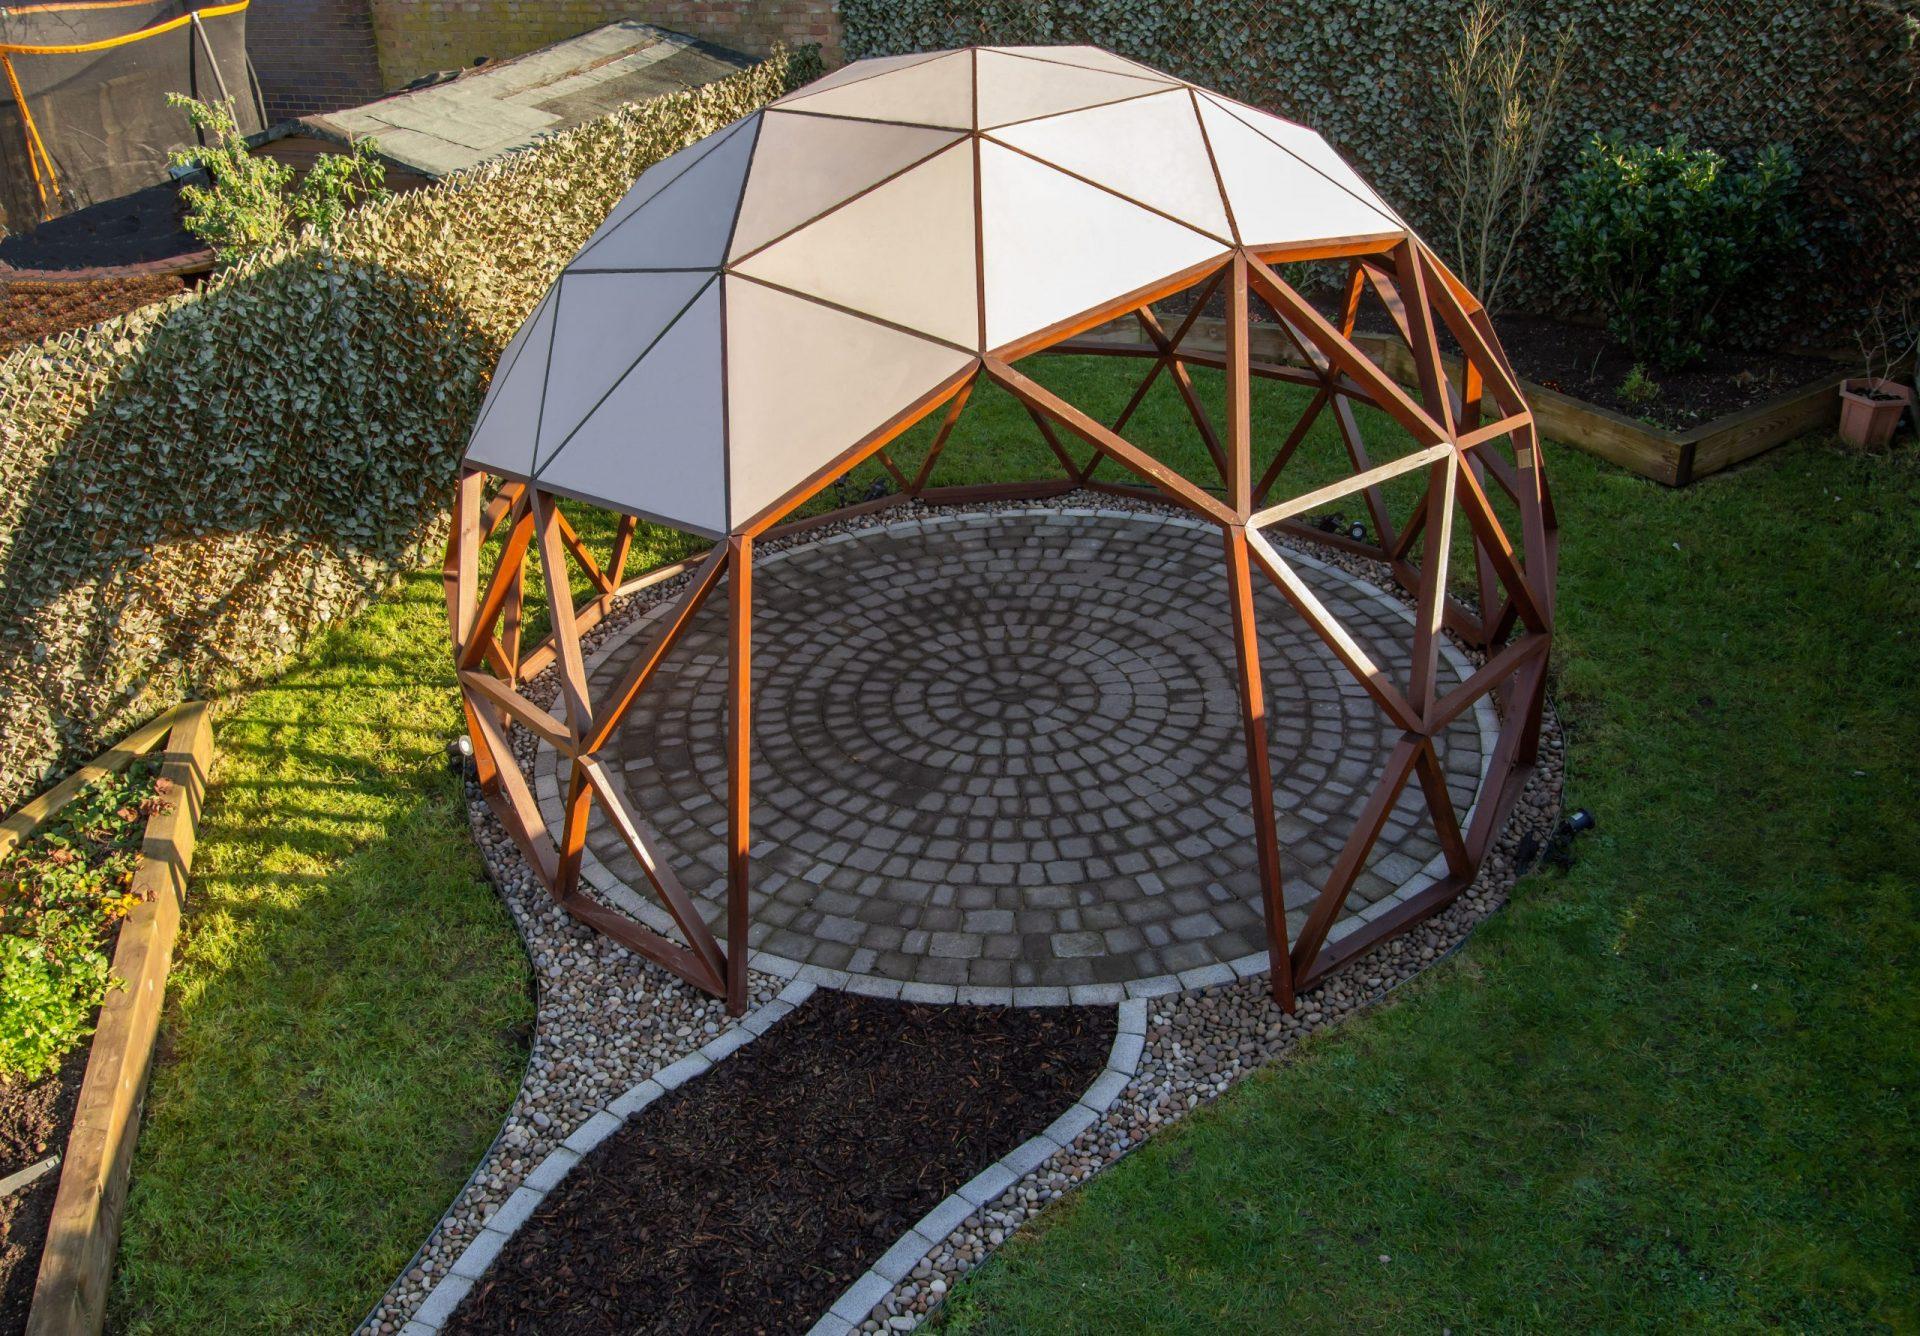 ArmaGado geodesic dome